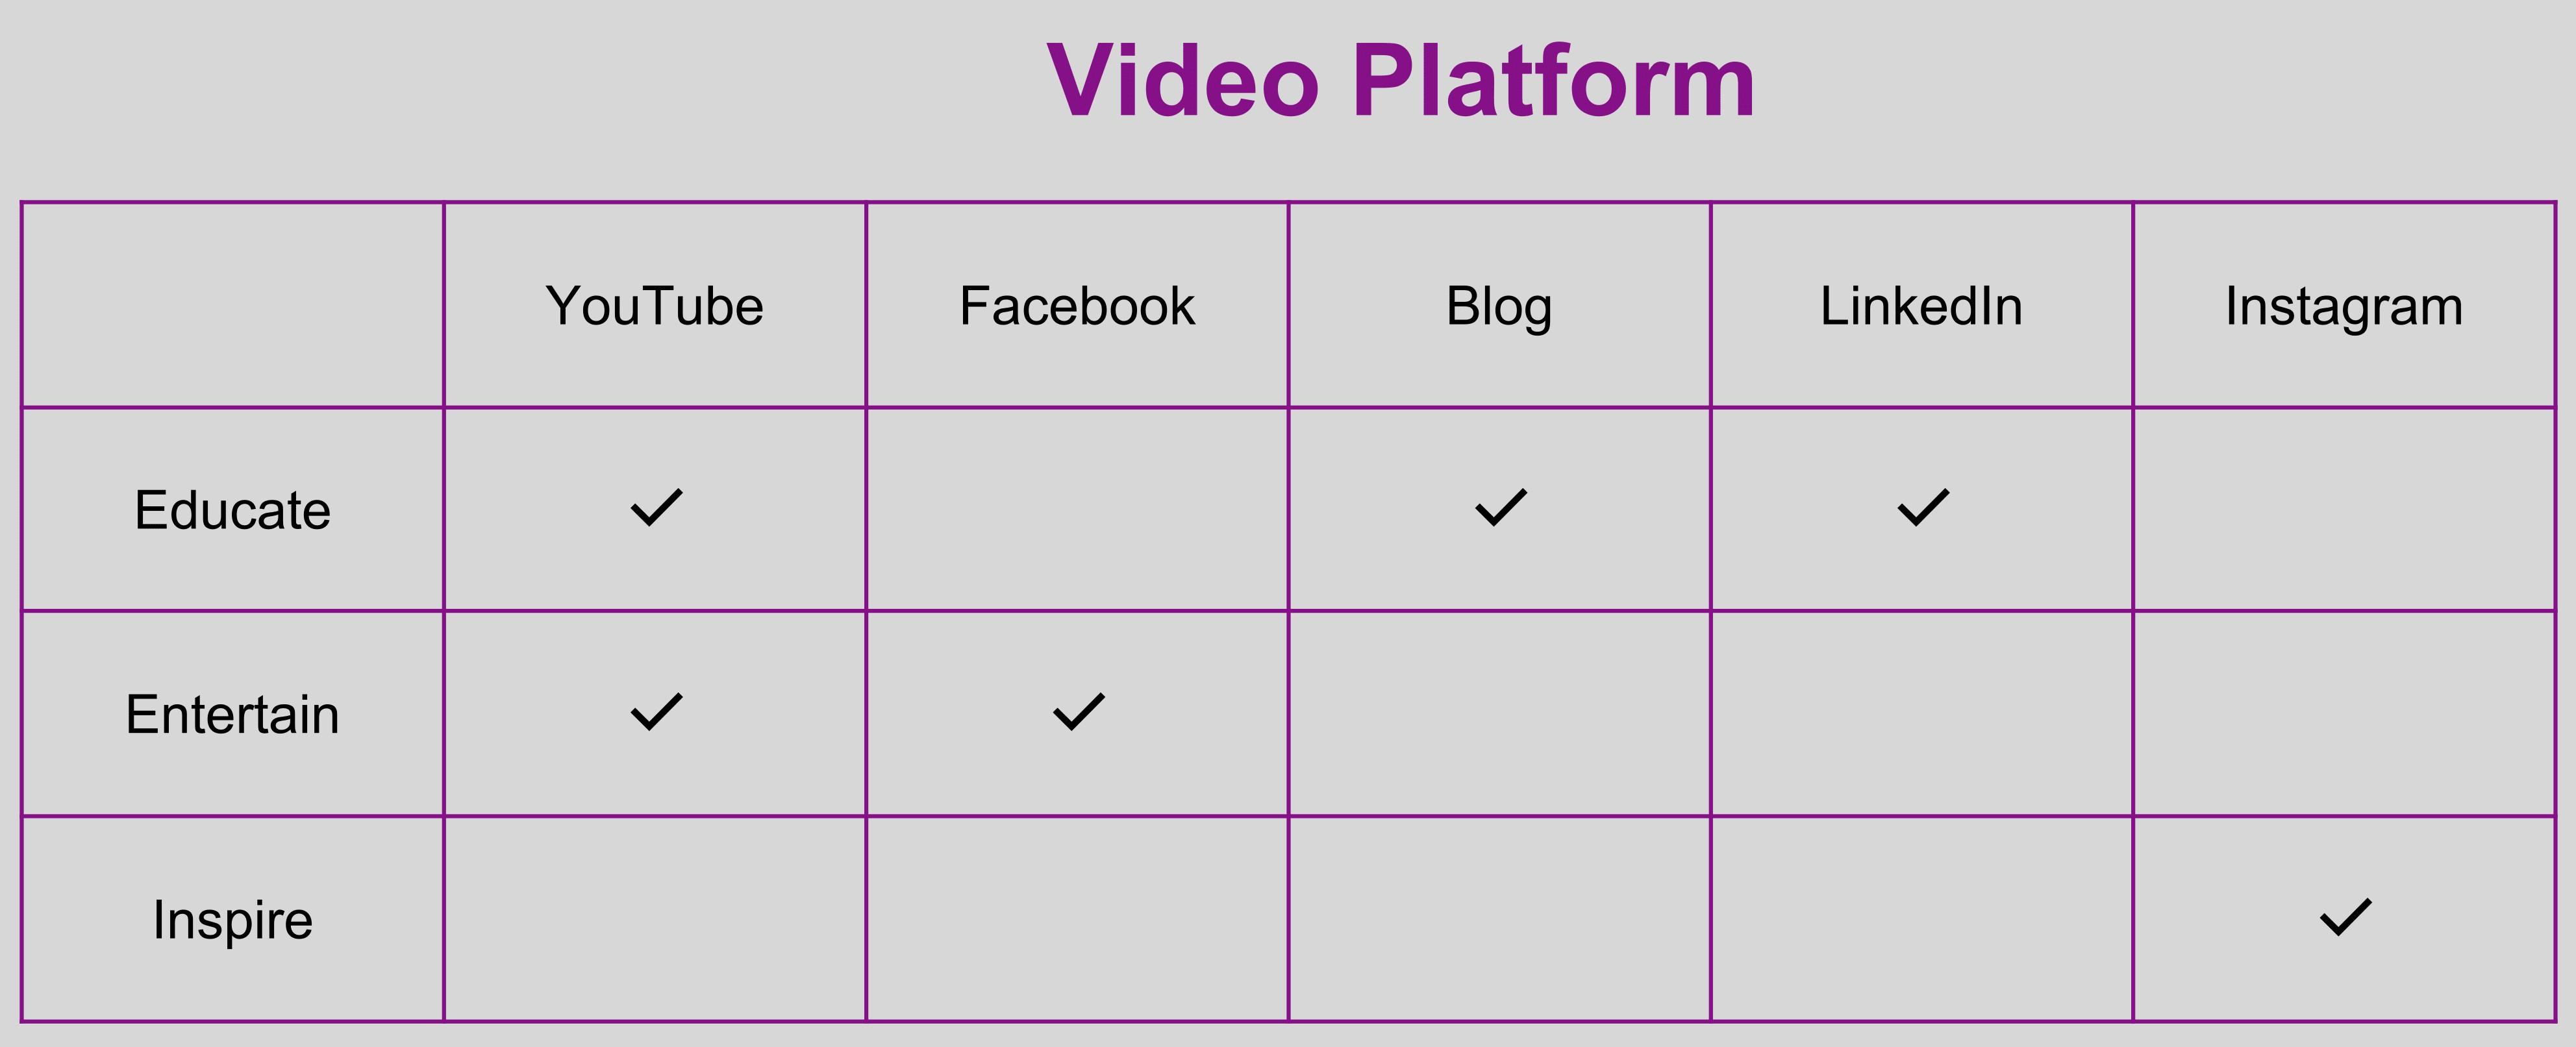 Video Platforms table